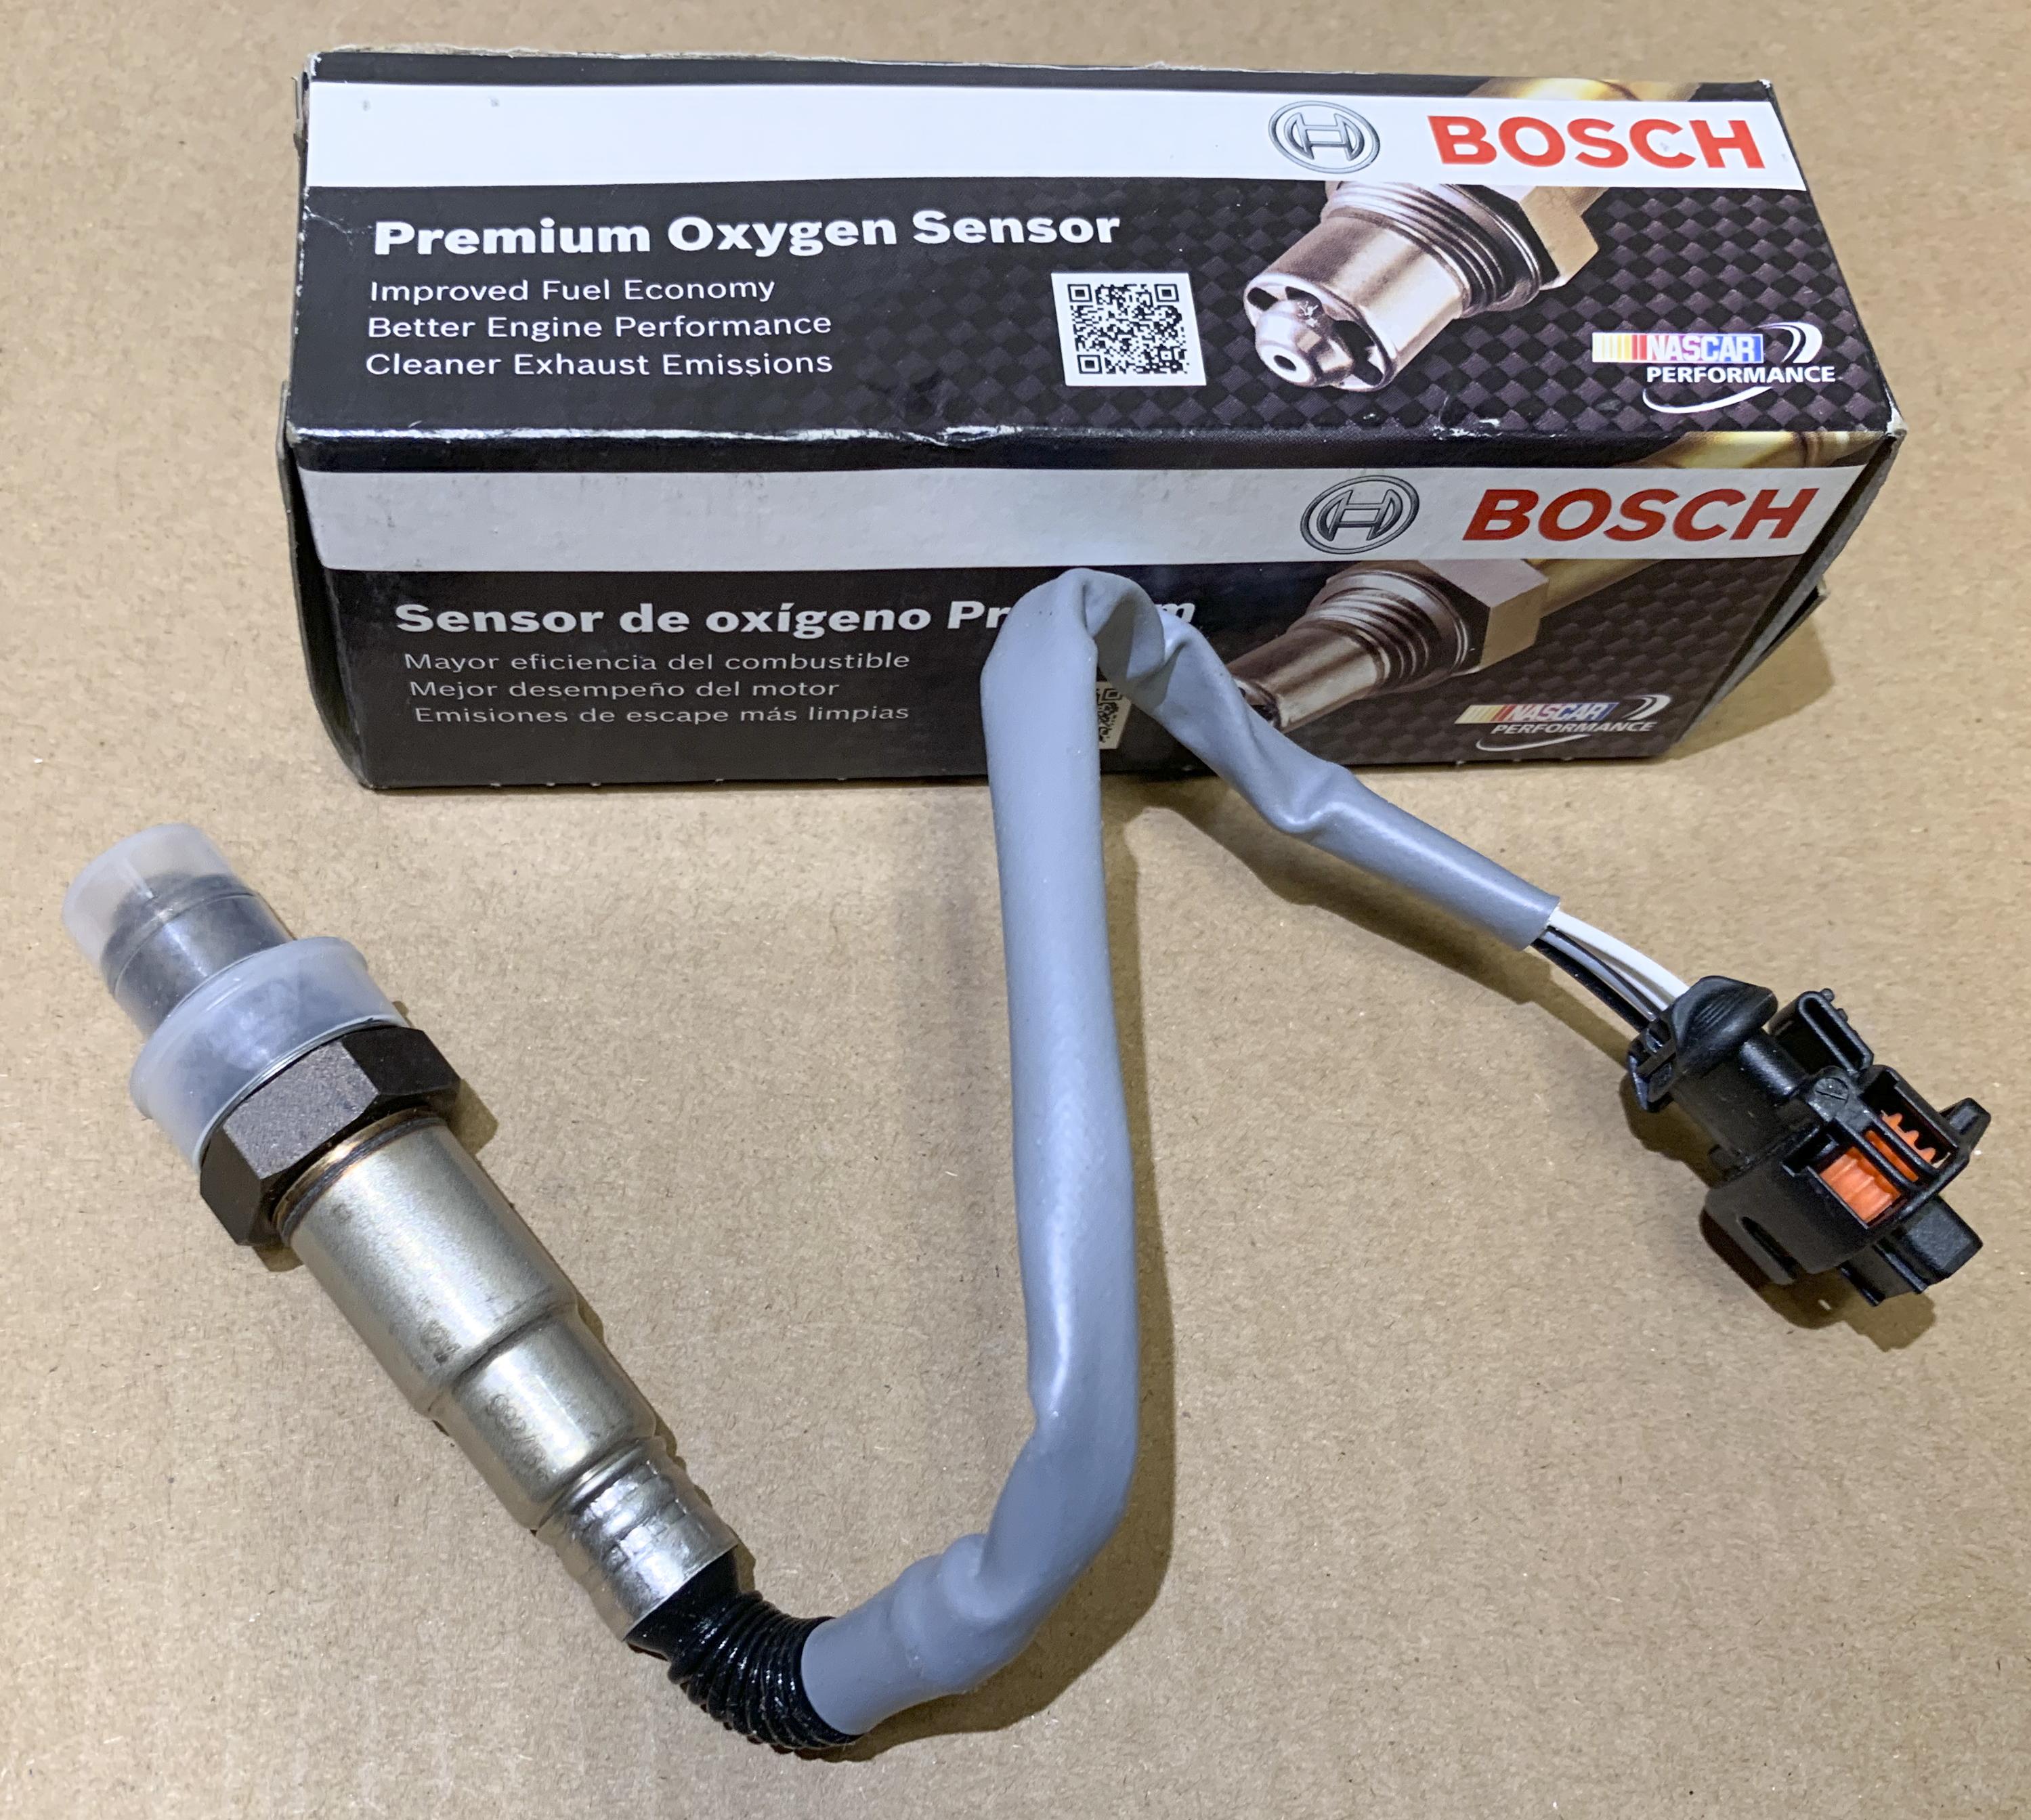 Bosch OE Oxygen Sensor For 2003-2004 Cadillac CTS 3.2L